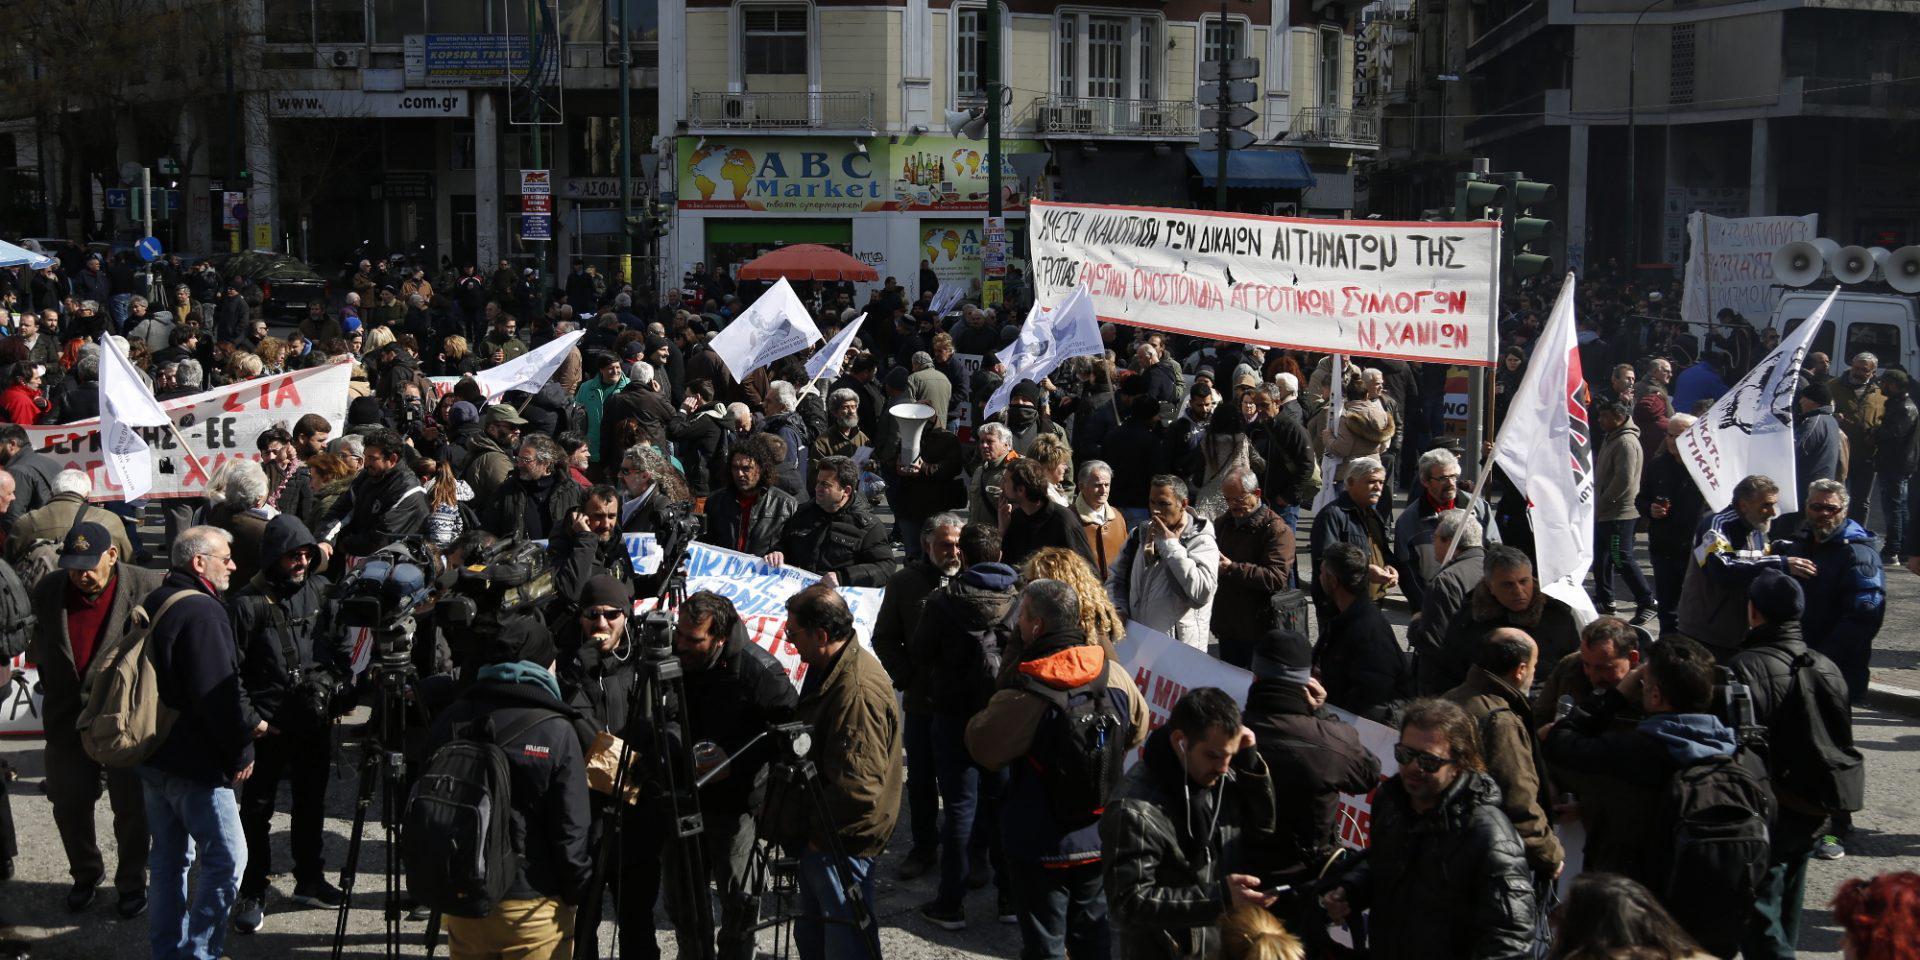 agrotes-sullaritirio-athina-1000 Στην Βουλή οι αγρότες – Σε εξέλιξη το μεγάλο συλλαλητήριο